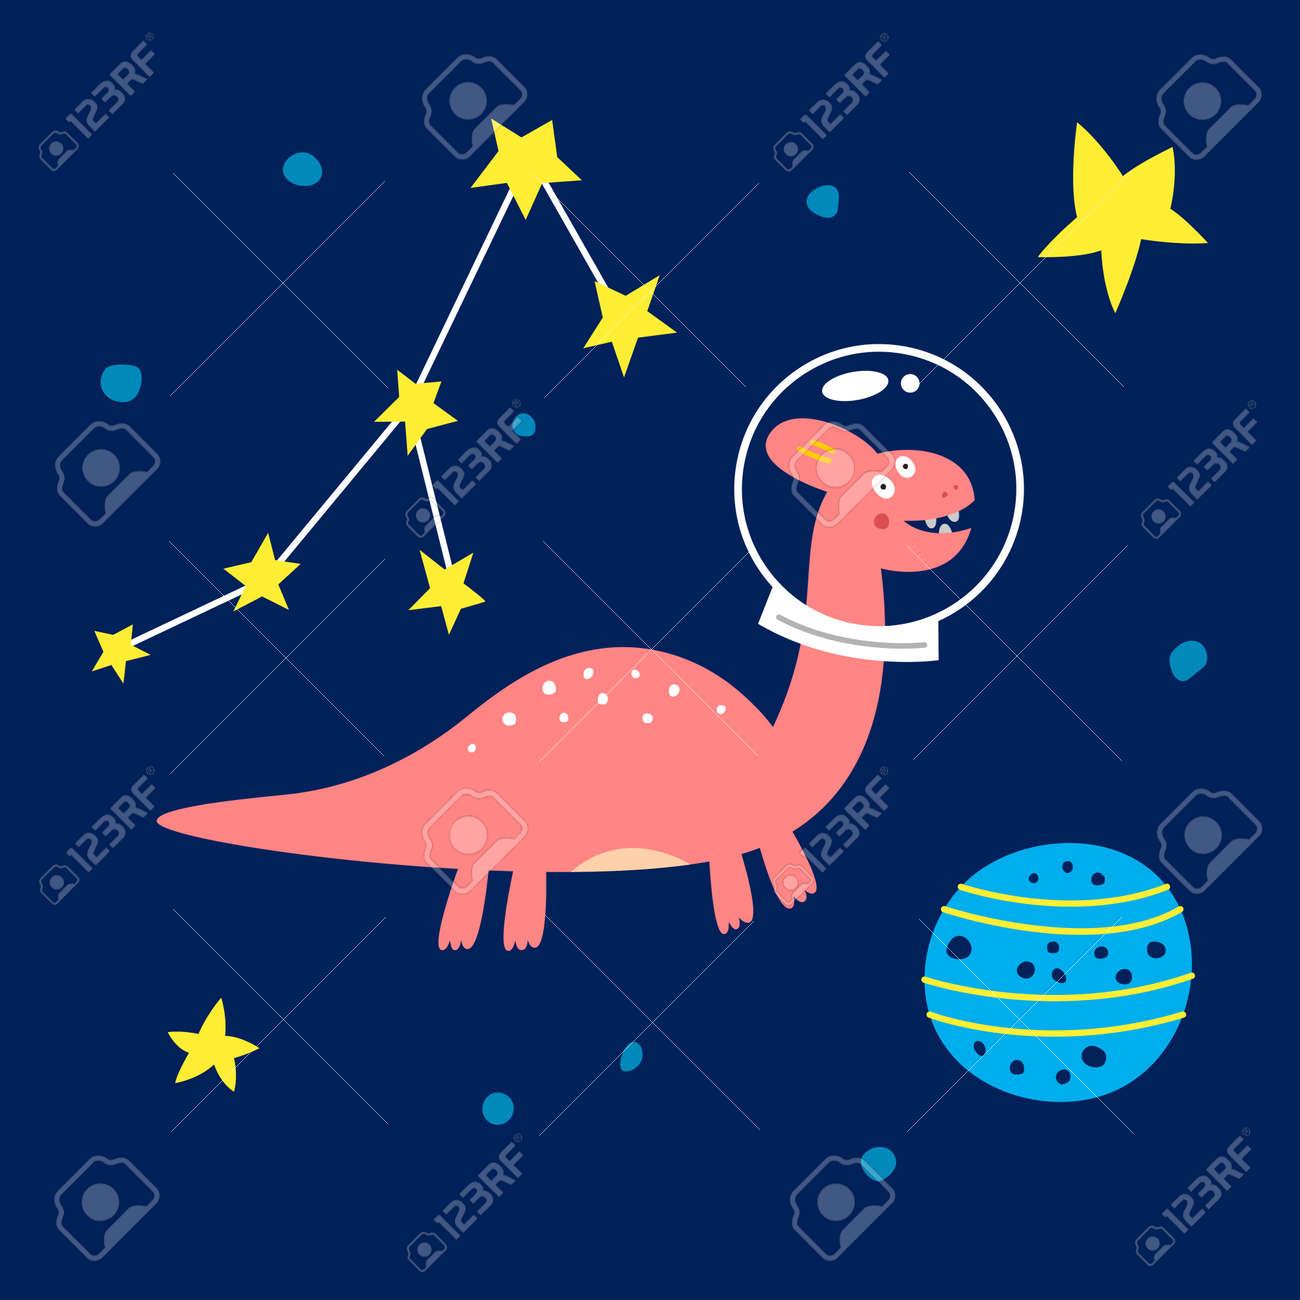 Space dinosaur, vector illustration for children fashion. - 169772192